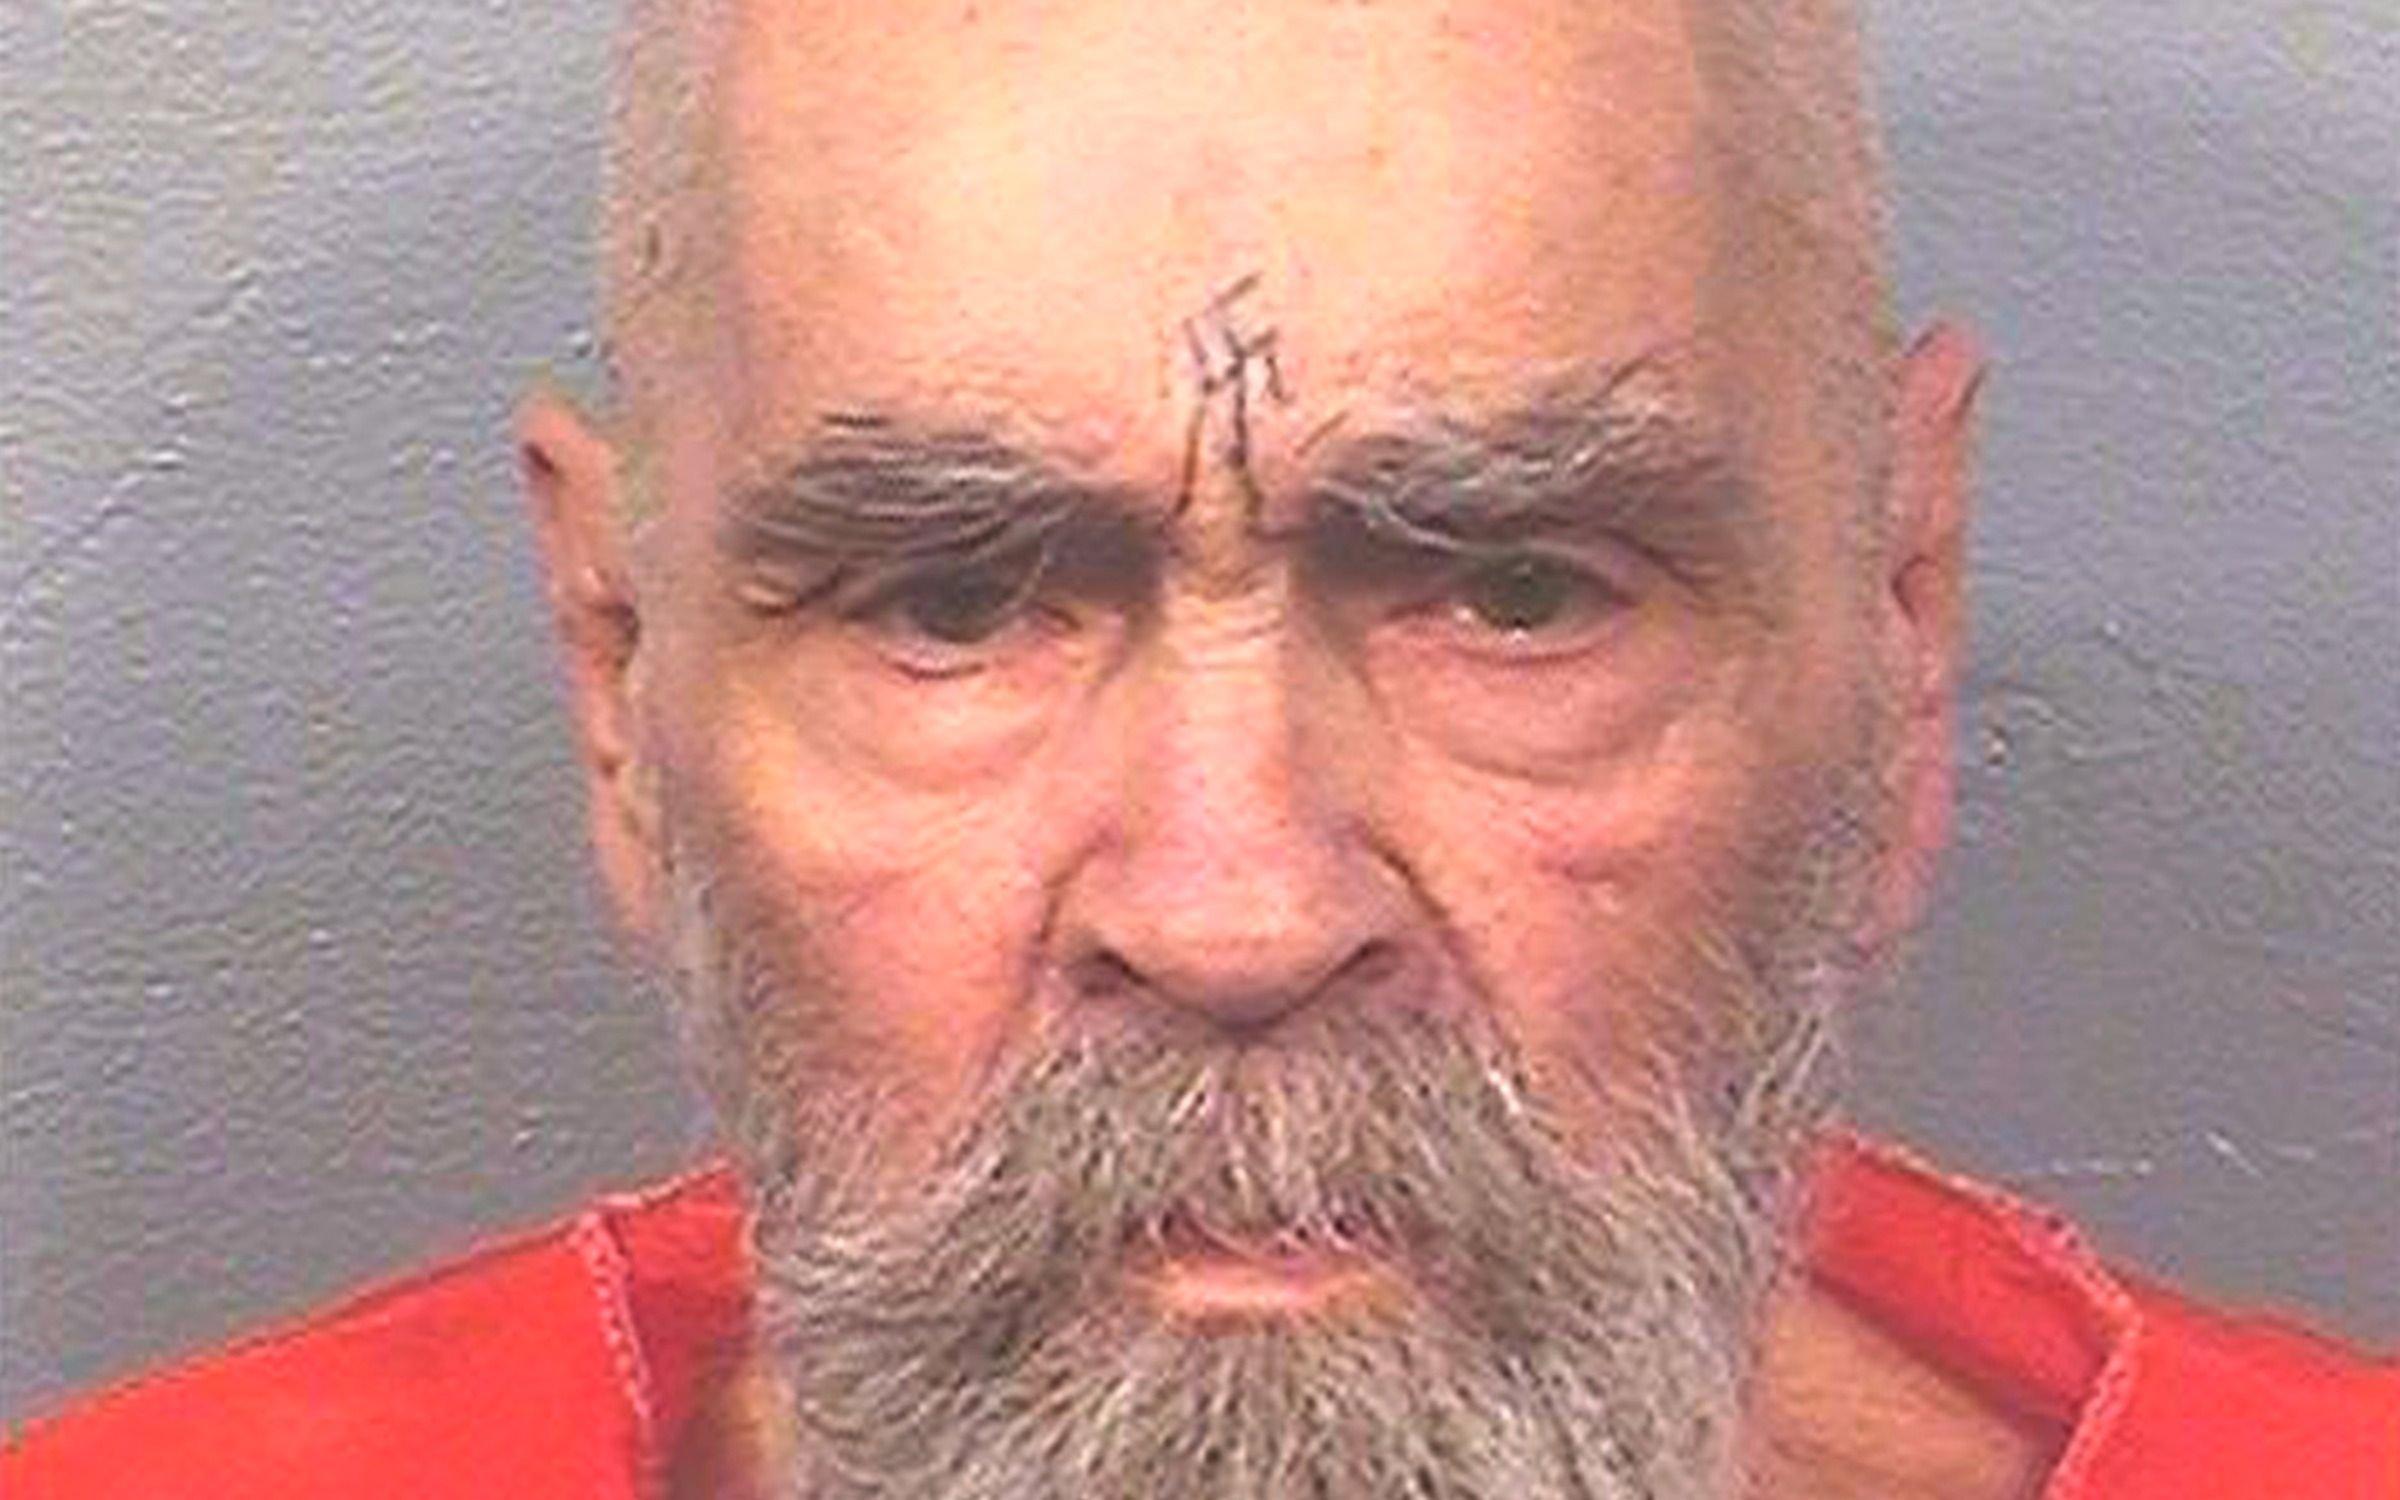 Muere Charles Manson, el asesino más famoso del siglo XX